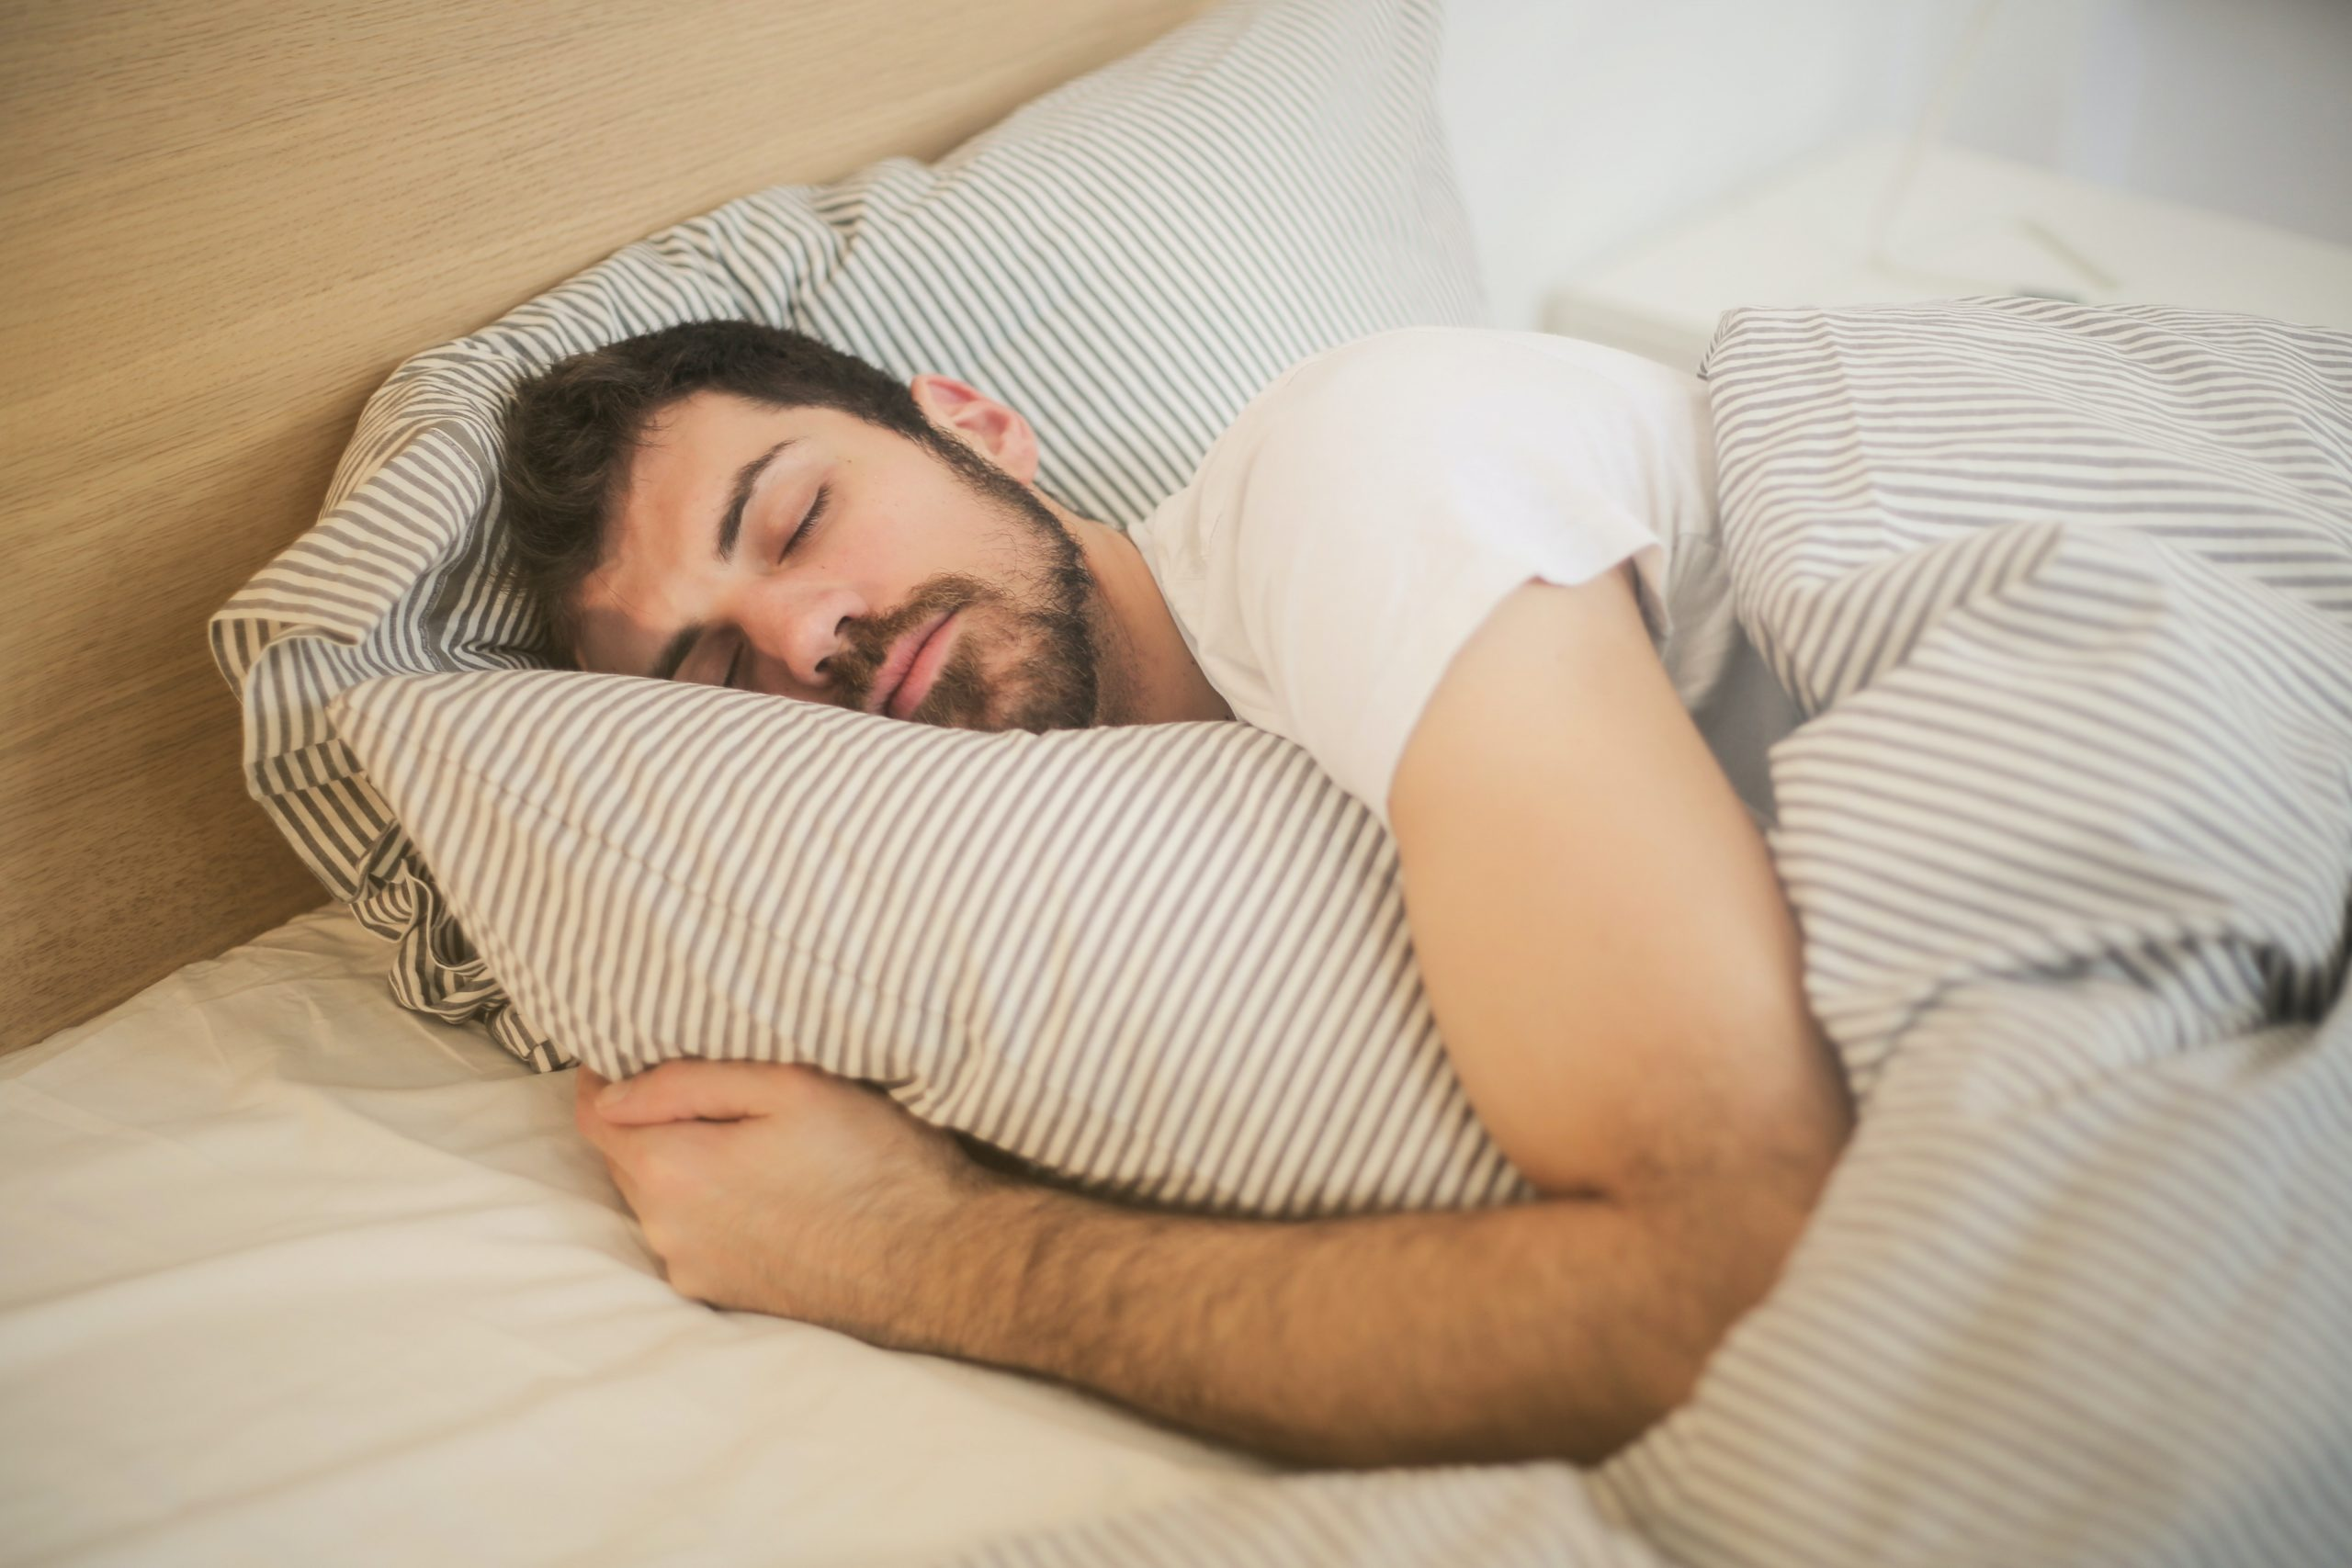 Kako dobro spati v obdobju epidemije koronavirusa (COVID-19)?